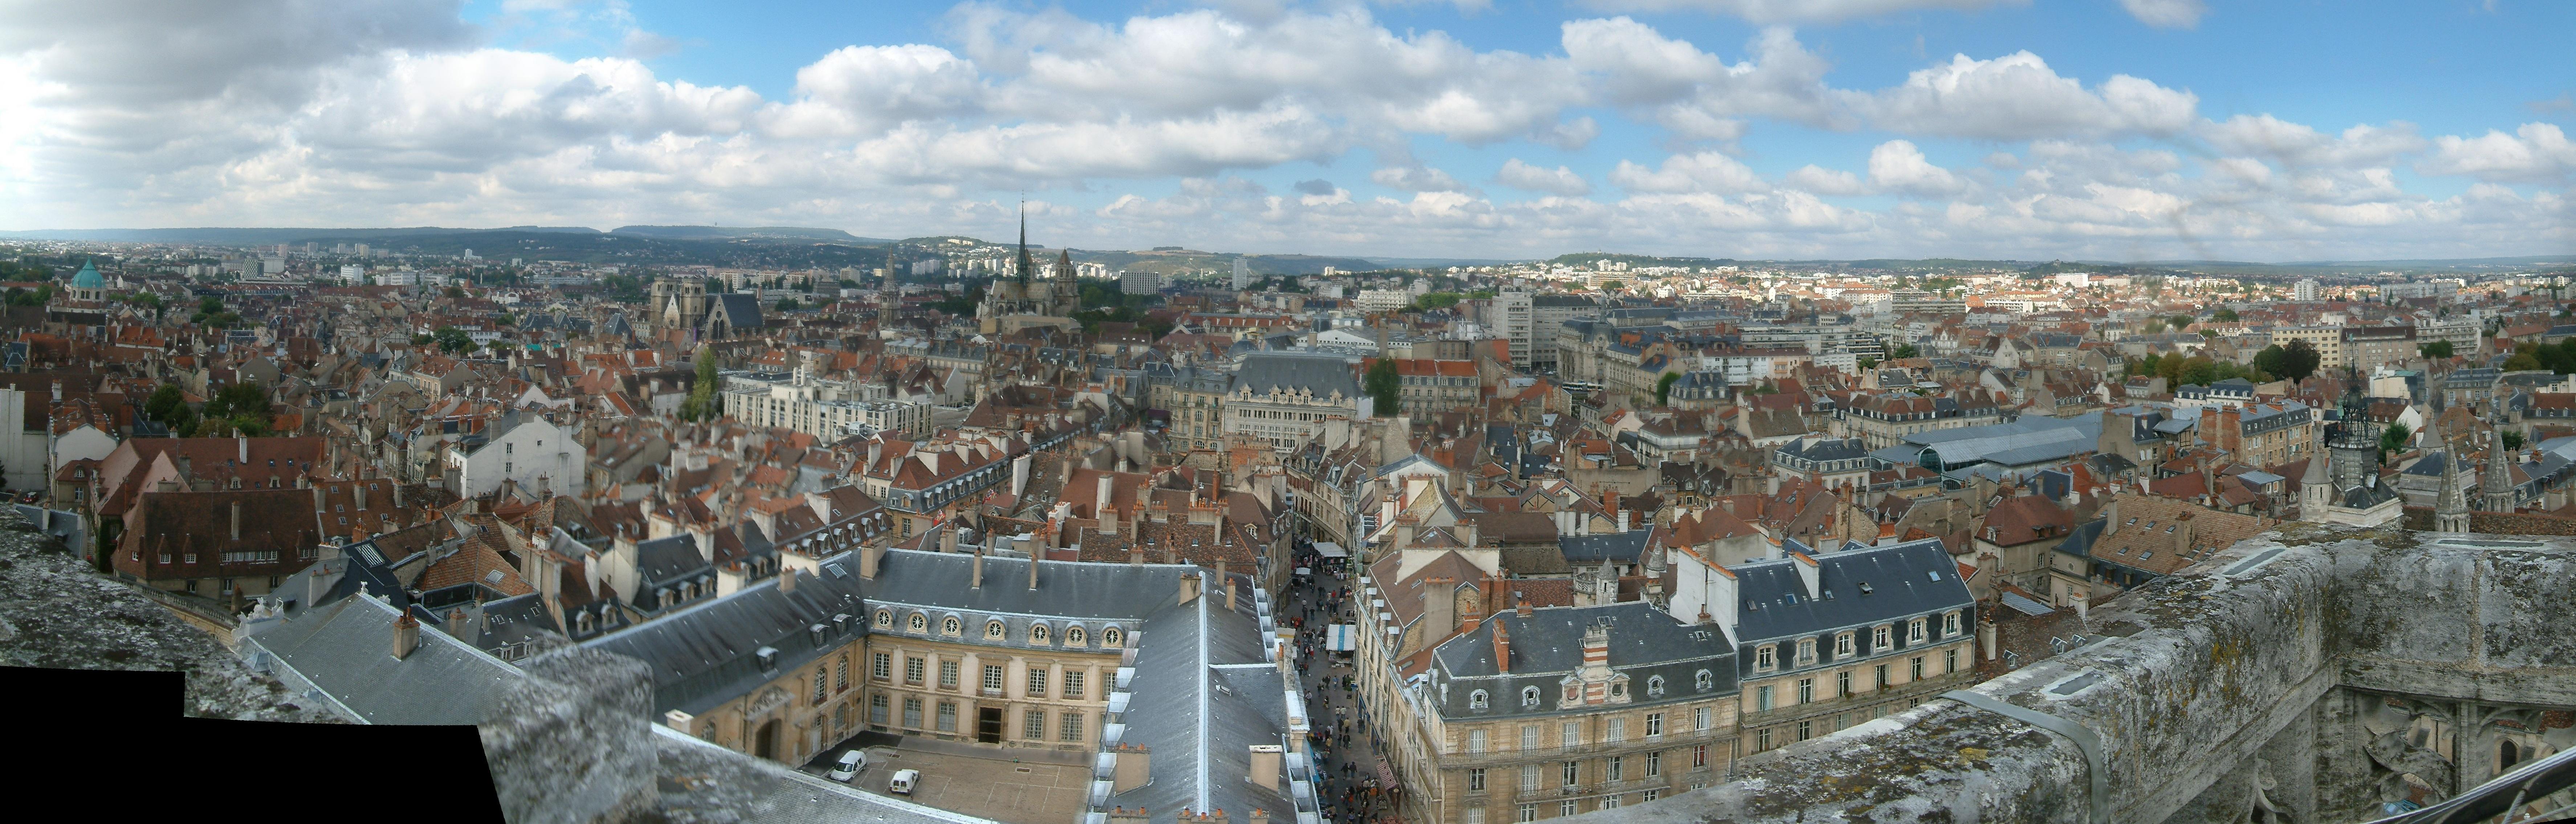 Scenic photos photo panoramique wikipedia - Definition de panoramique ...